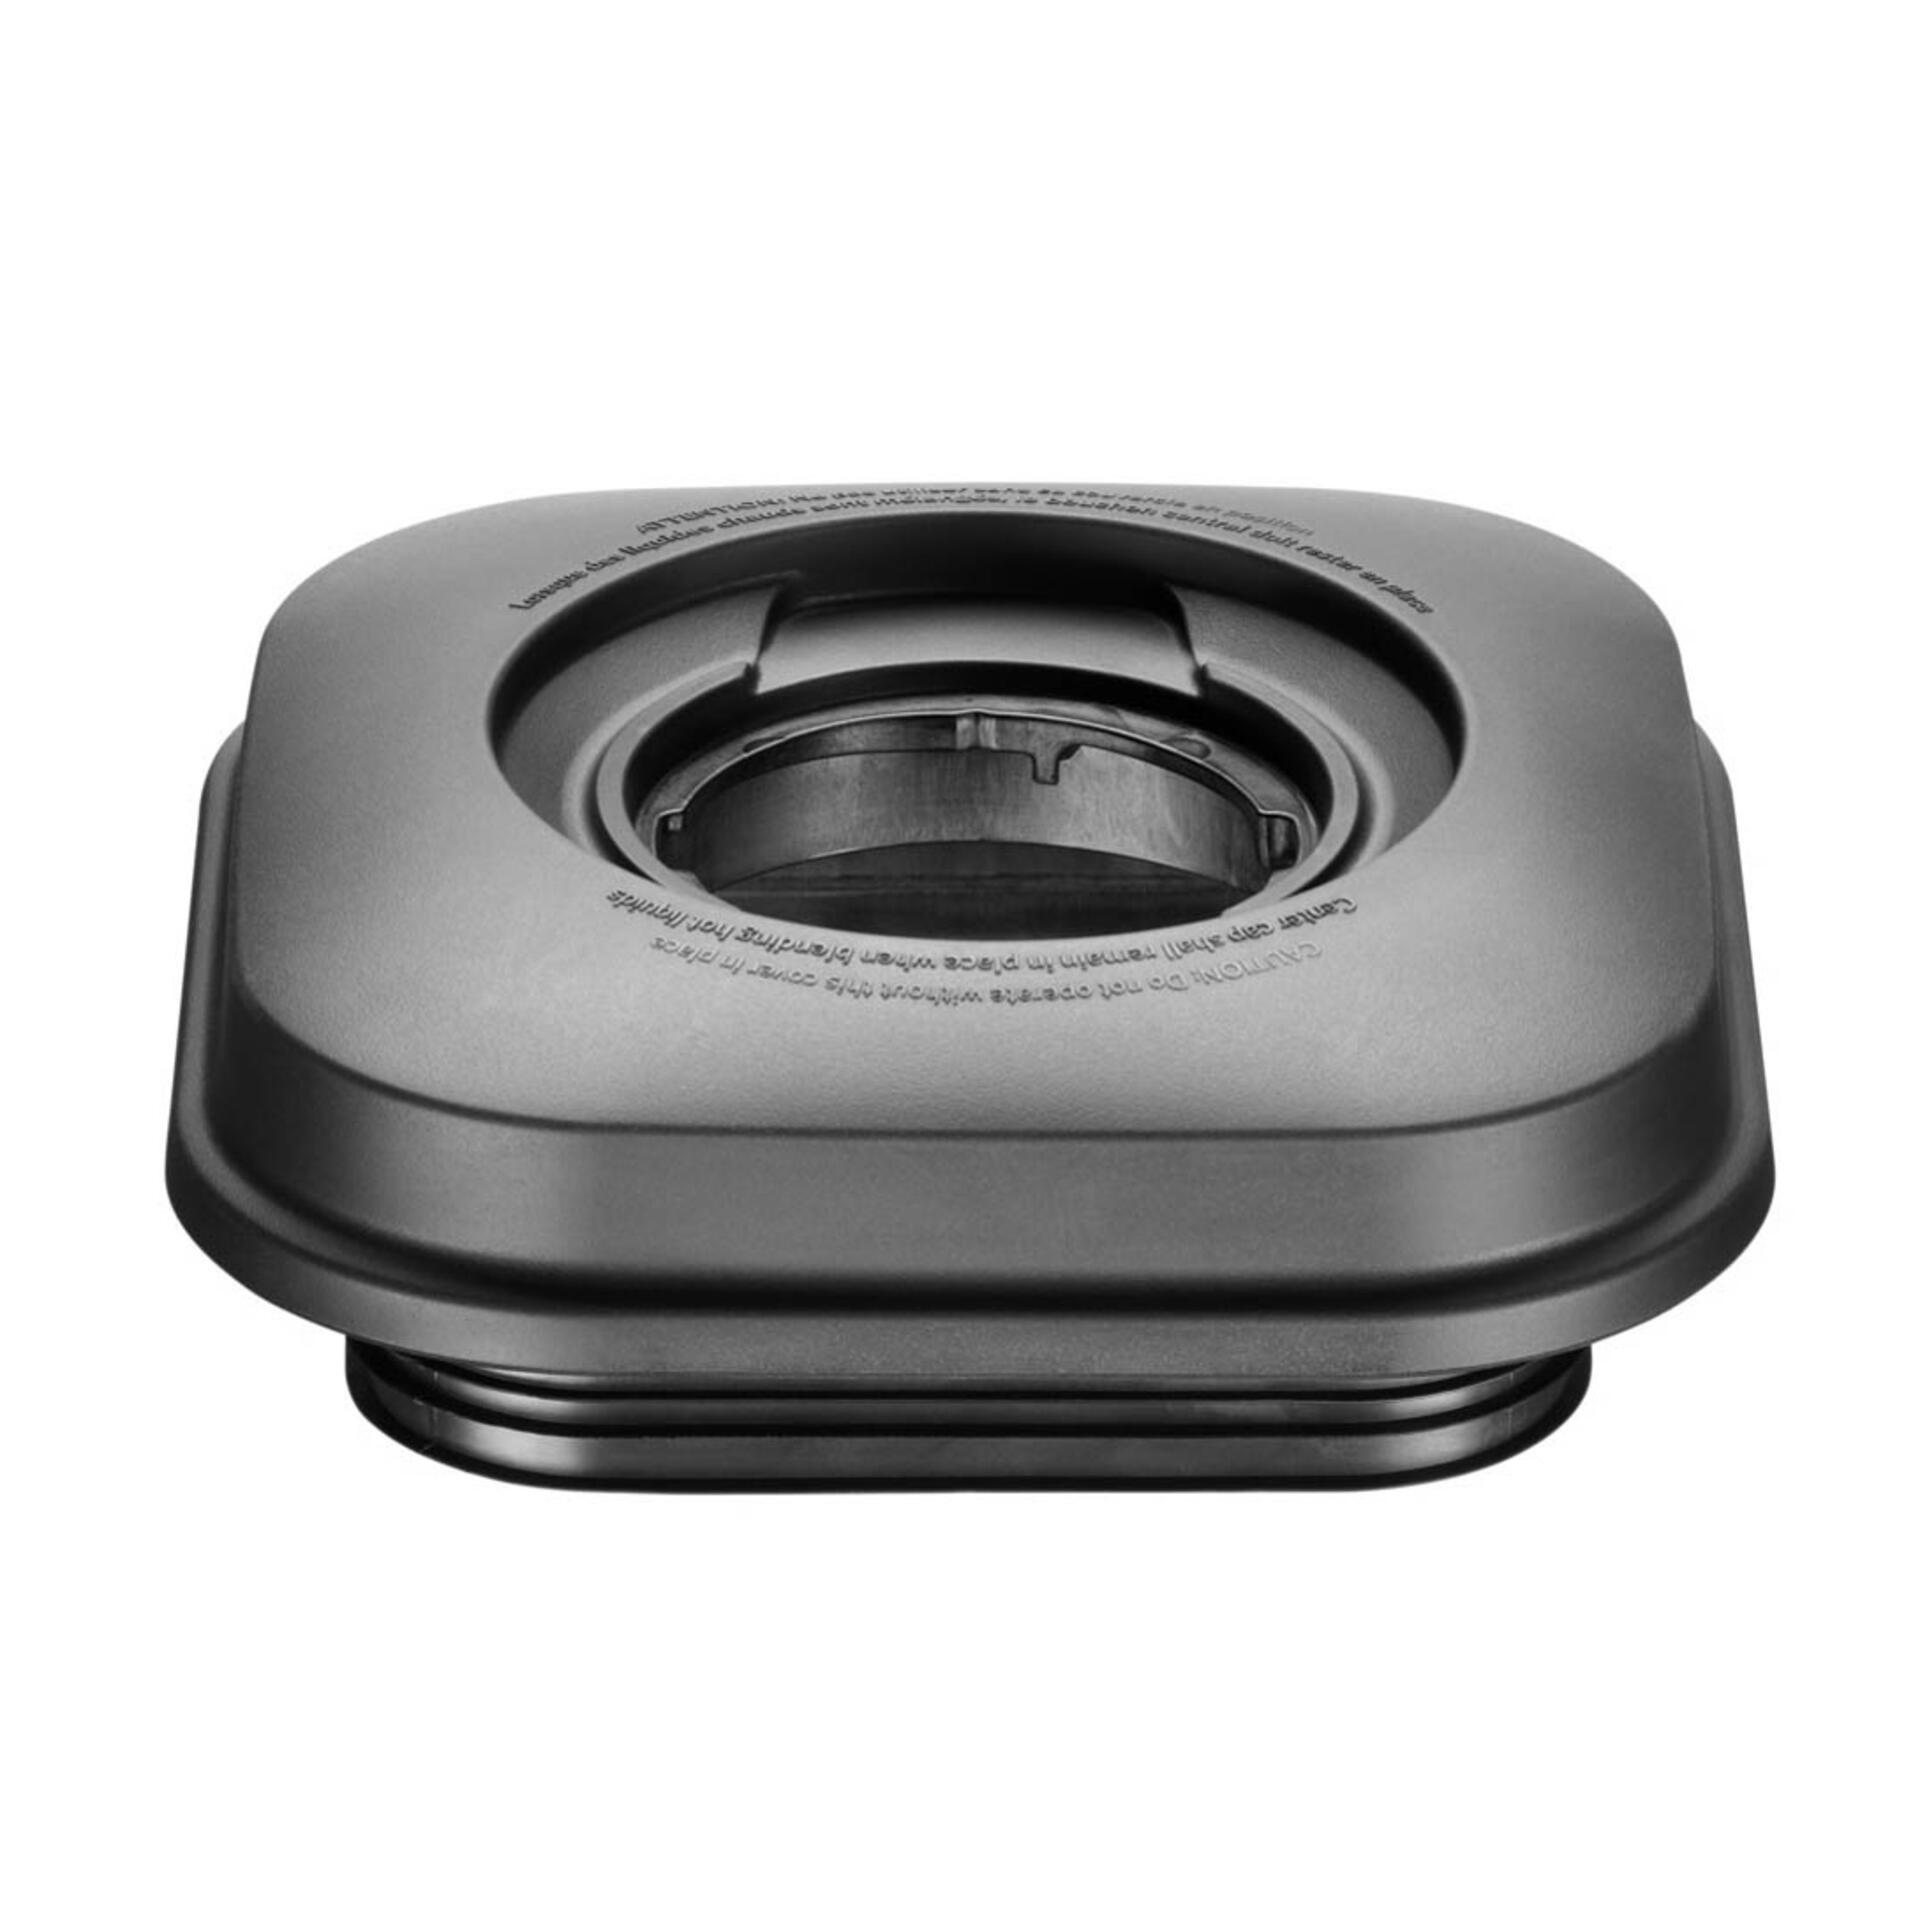 Kitchenaid Artisan Power Plus Blender Standmixer 5KSB8270 Gusseisen Schwarz